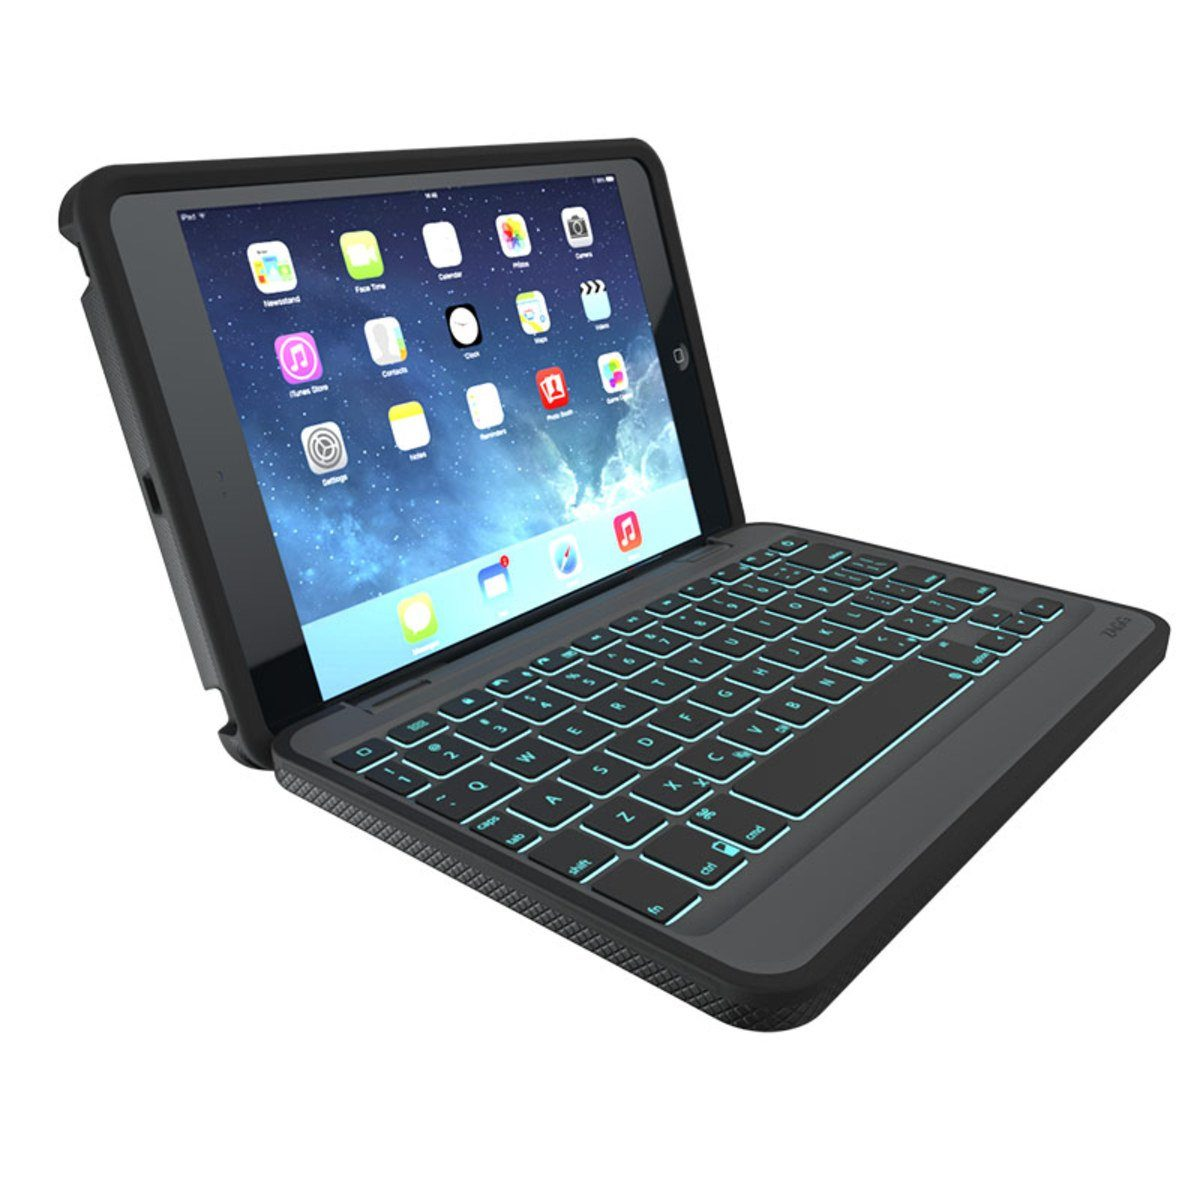 ZAGG Tablettasche »Outdoor Folio Keyboard Case für iPad Mini/Mini 2«